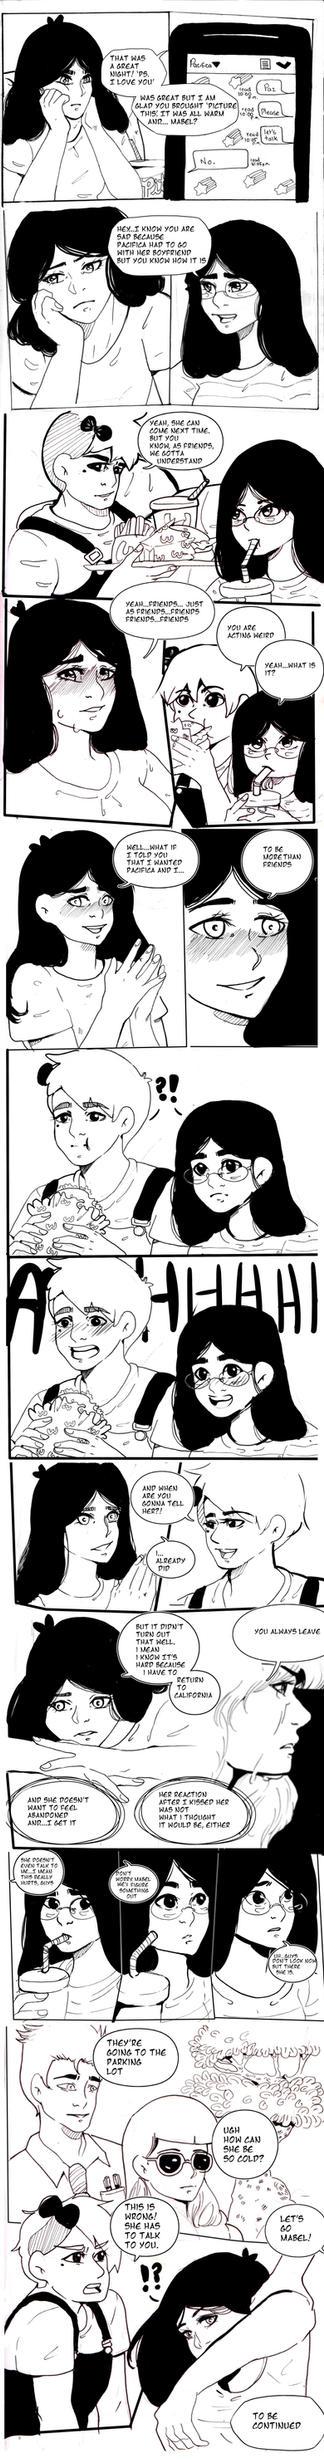 Comic 2 by RachelLevitte